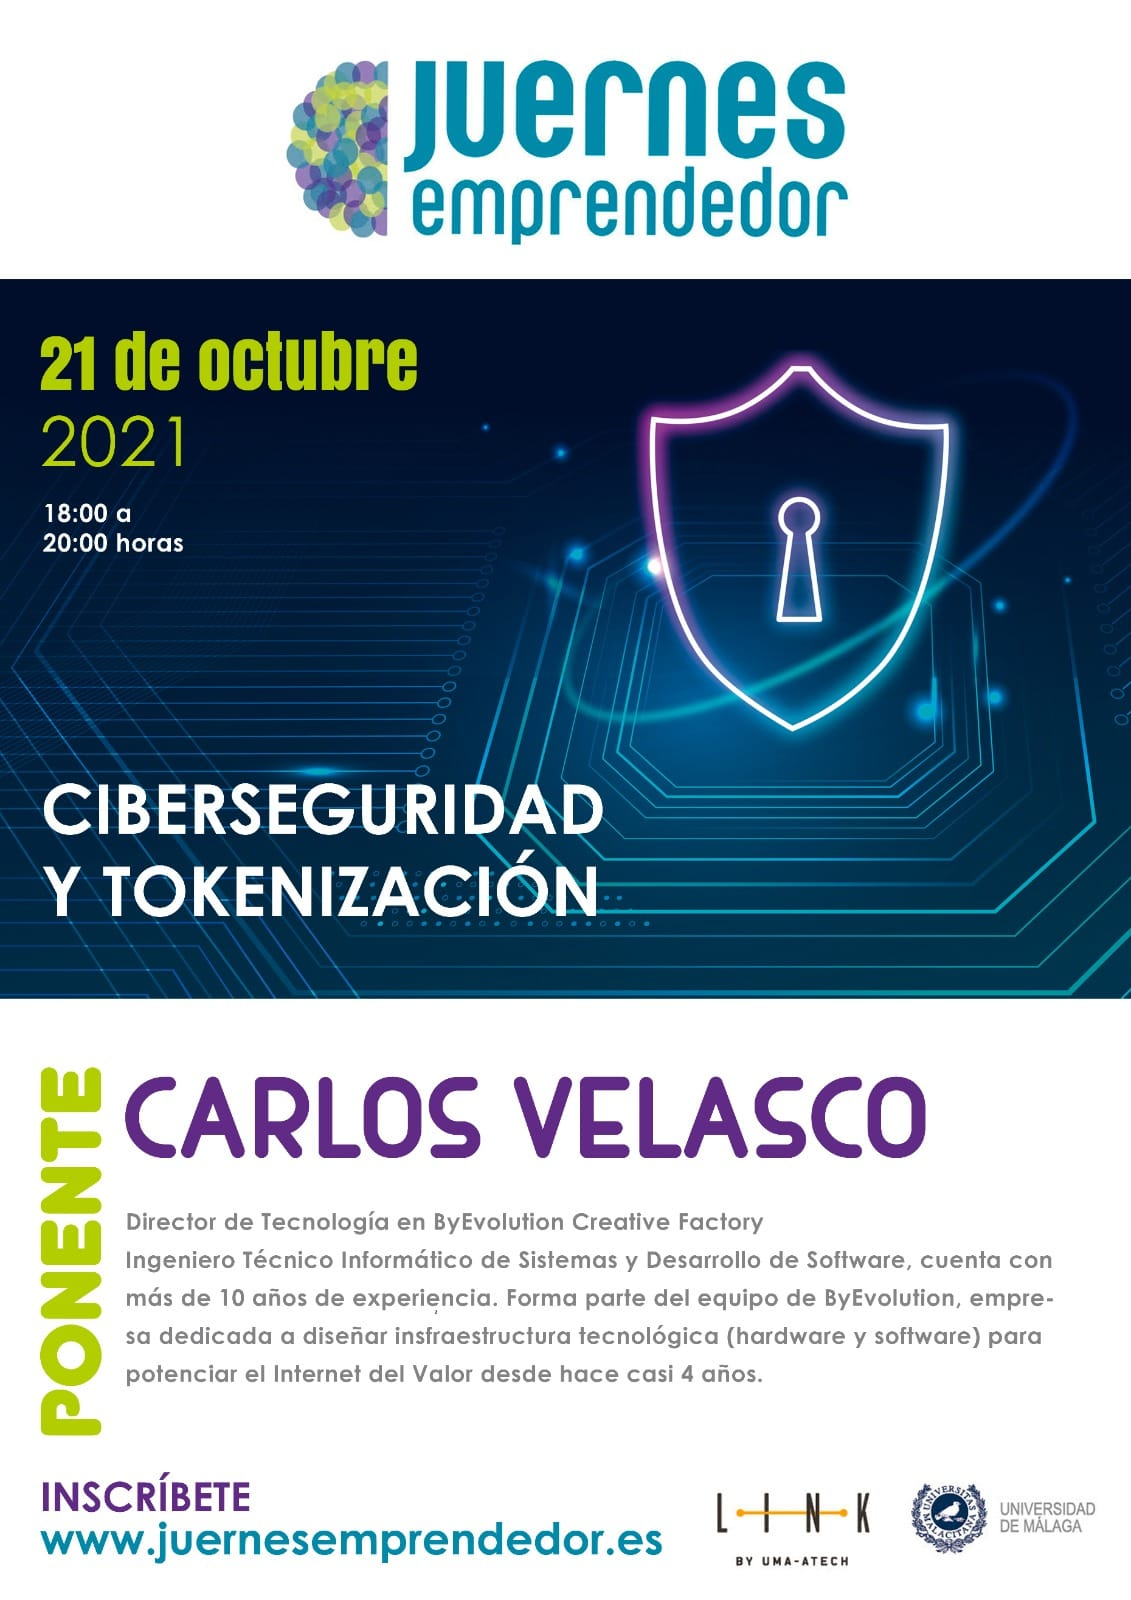 Carlos Velasco ByEvolution Seguridad blockchain token